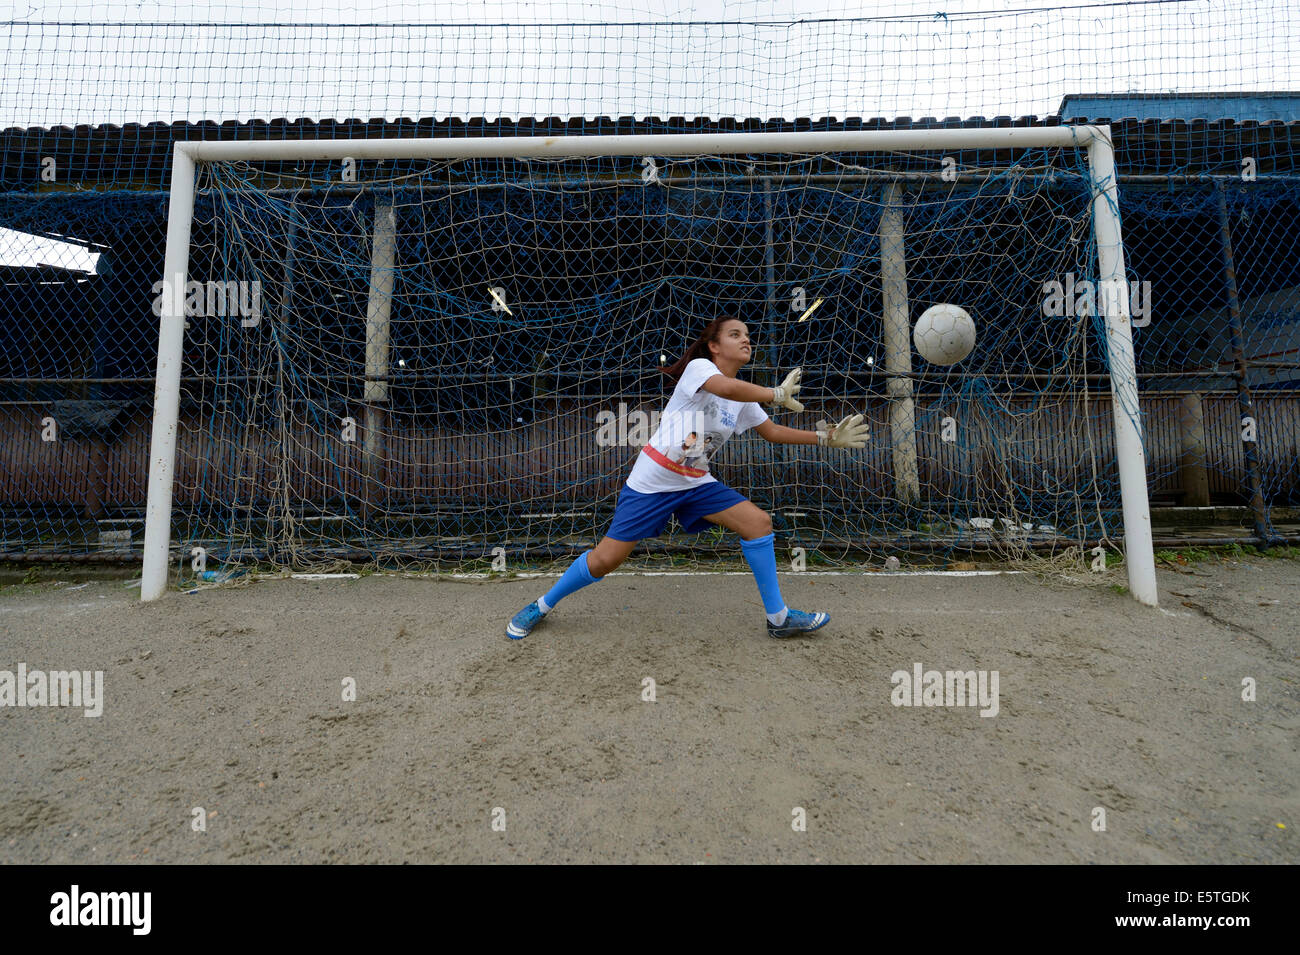 Teenager, 16 years, goalkeeper saving the ball, Craque do Amanha social project, São Gonçalo, Niterói, - Stock Image